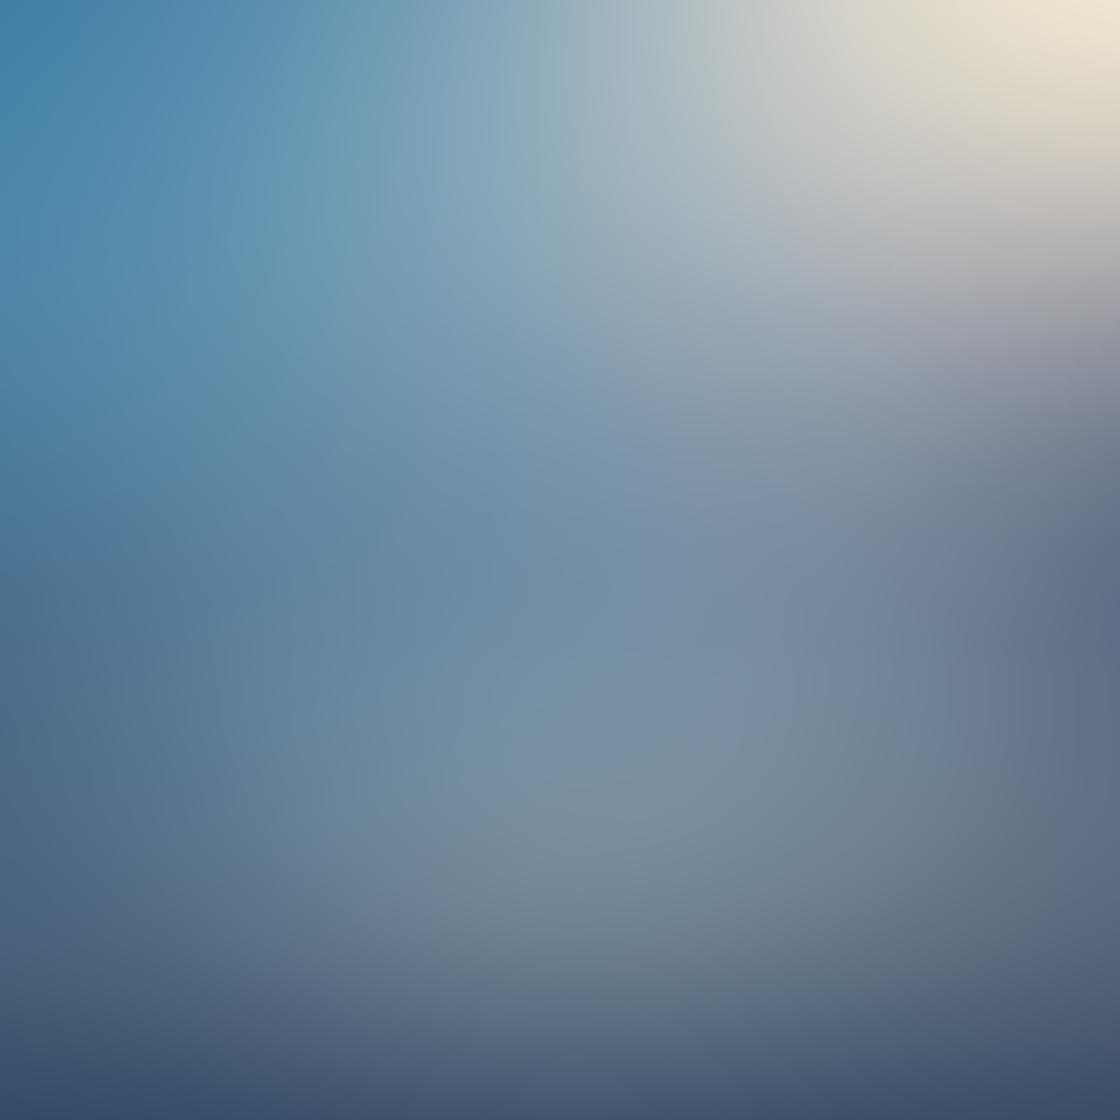 iPhone Weather Photo 33